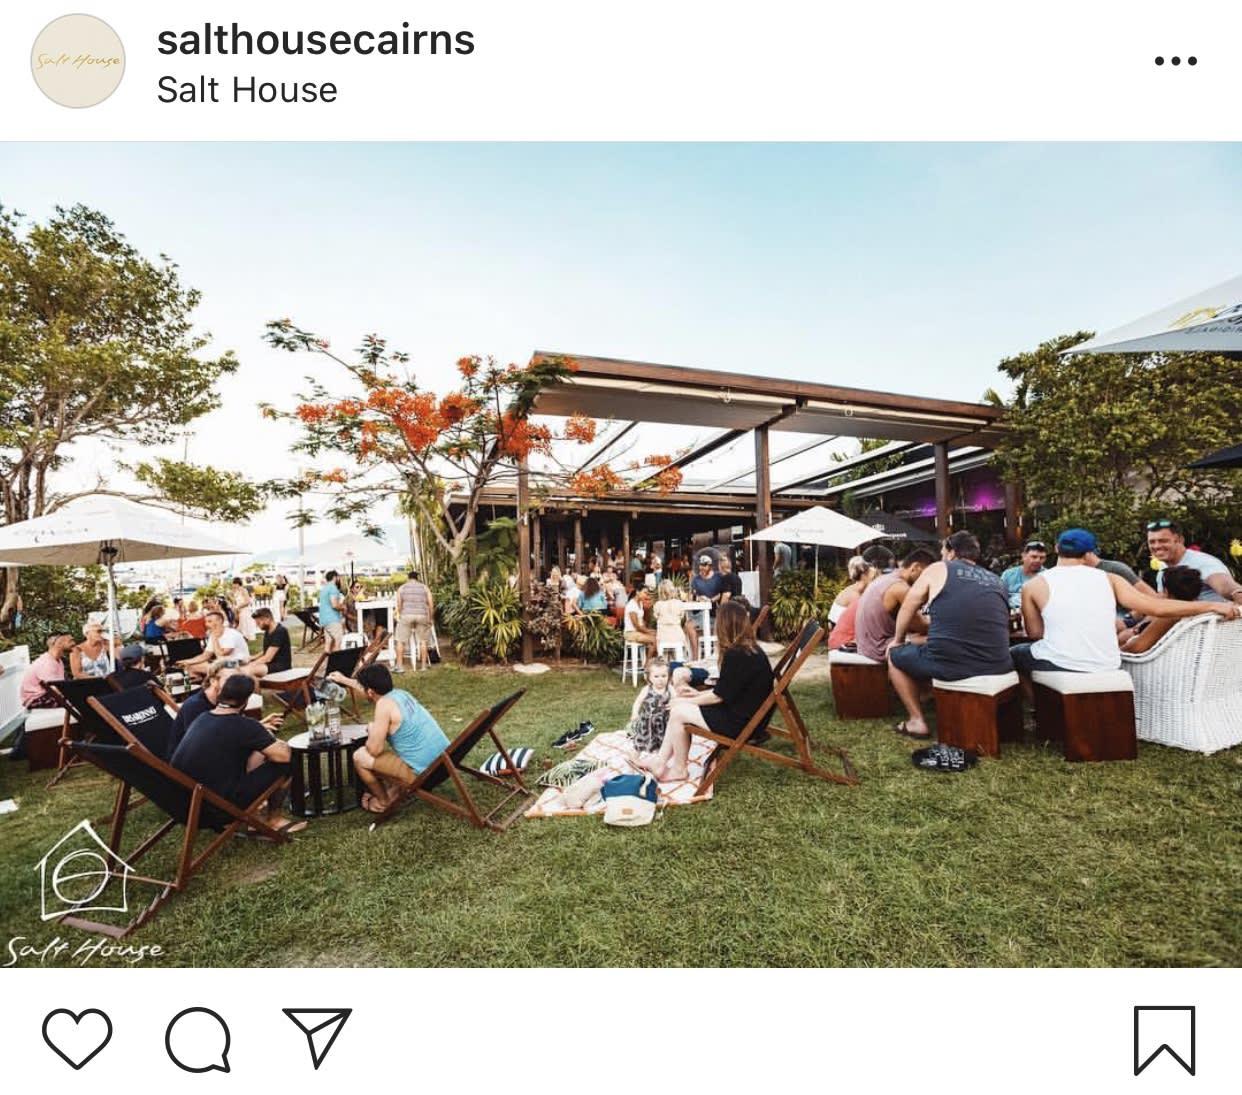 Salt house cairns